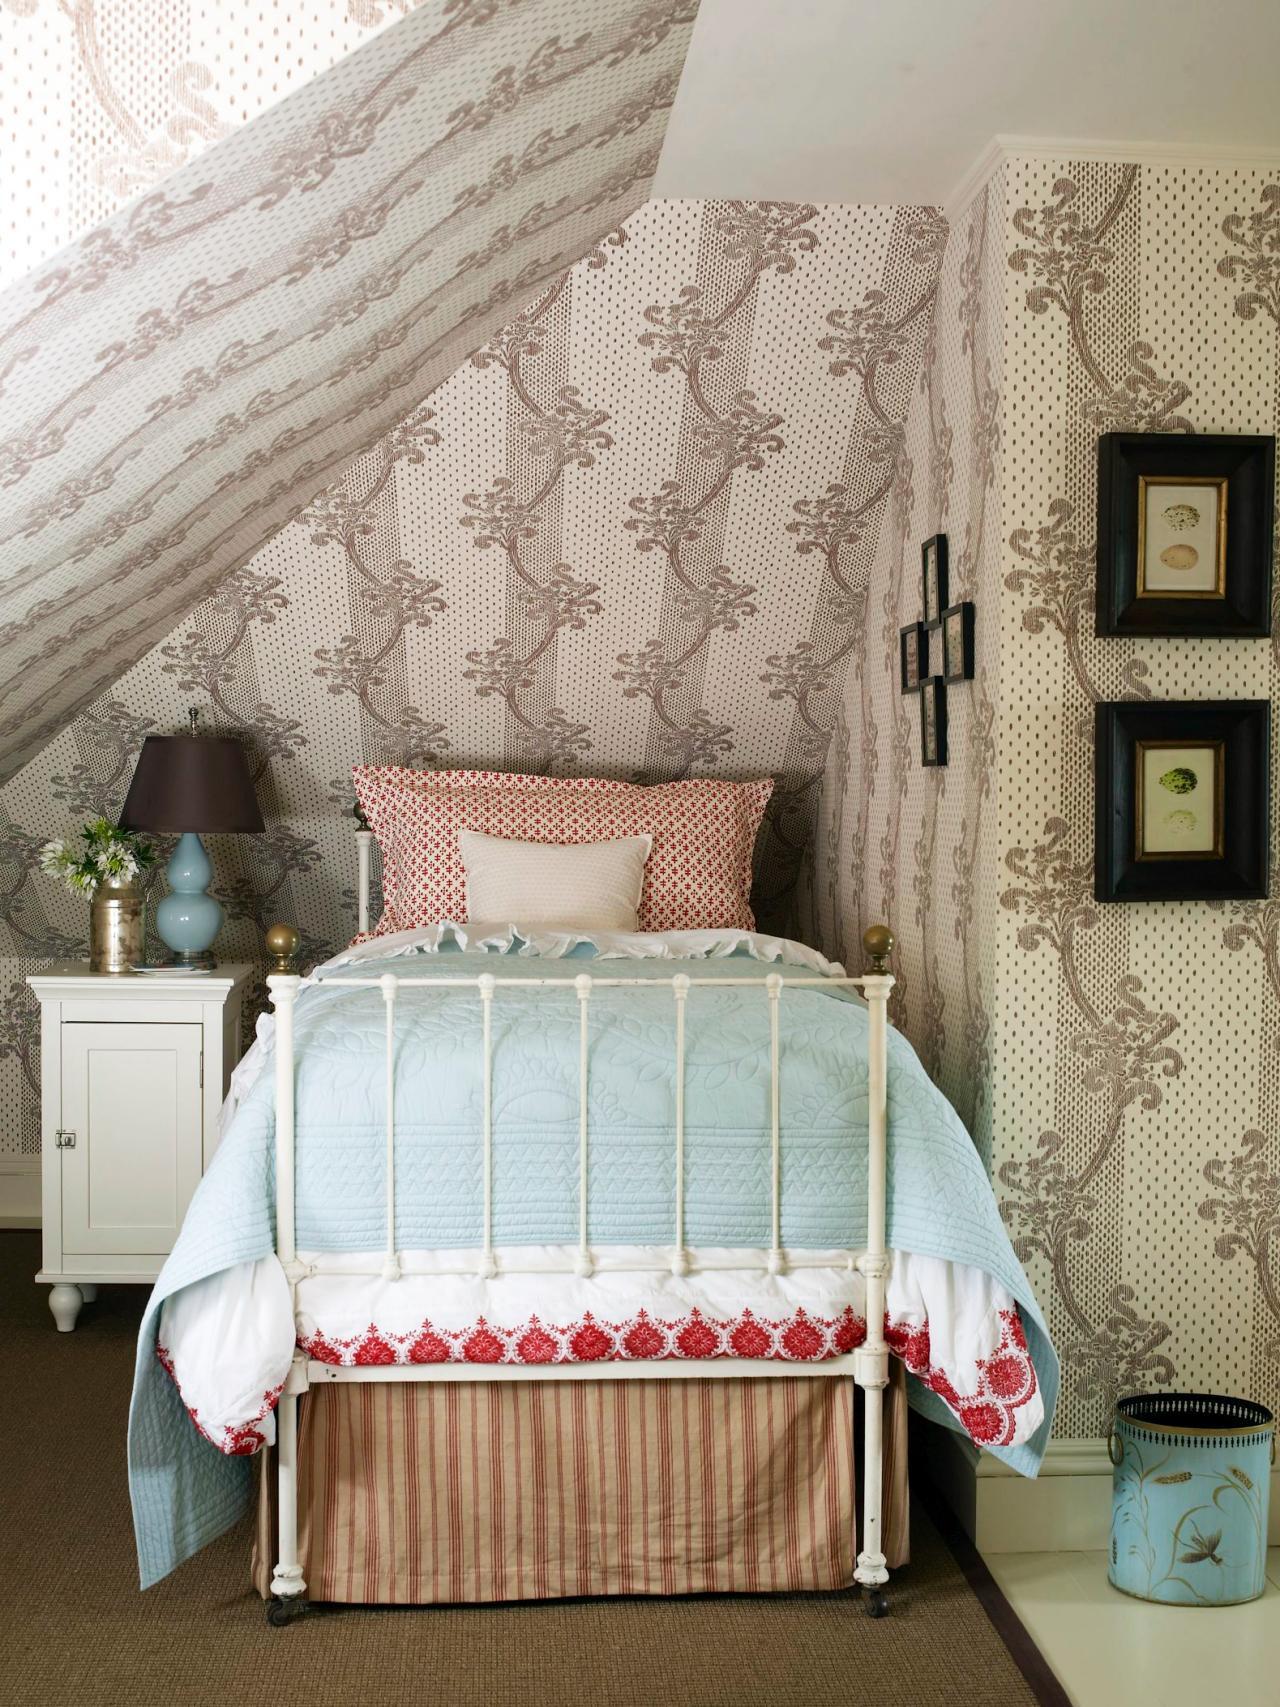 Shabby Chic Bedroom Ideas  25 Shabby Chic Style Bedroom Design Ideas Decoration Love